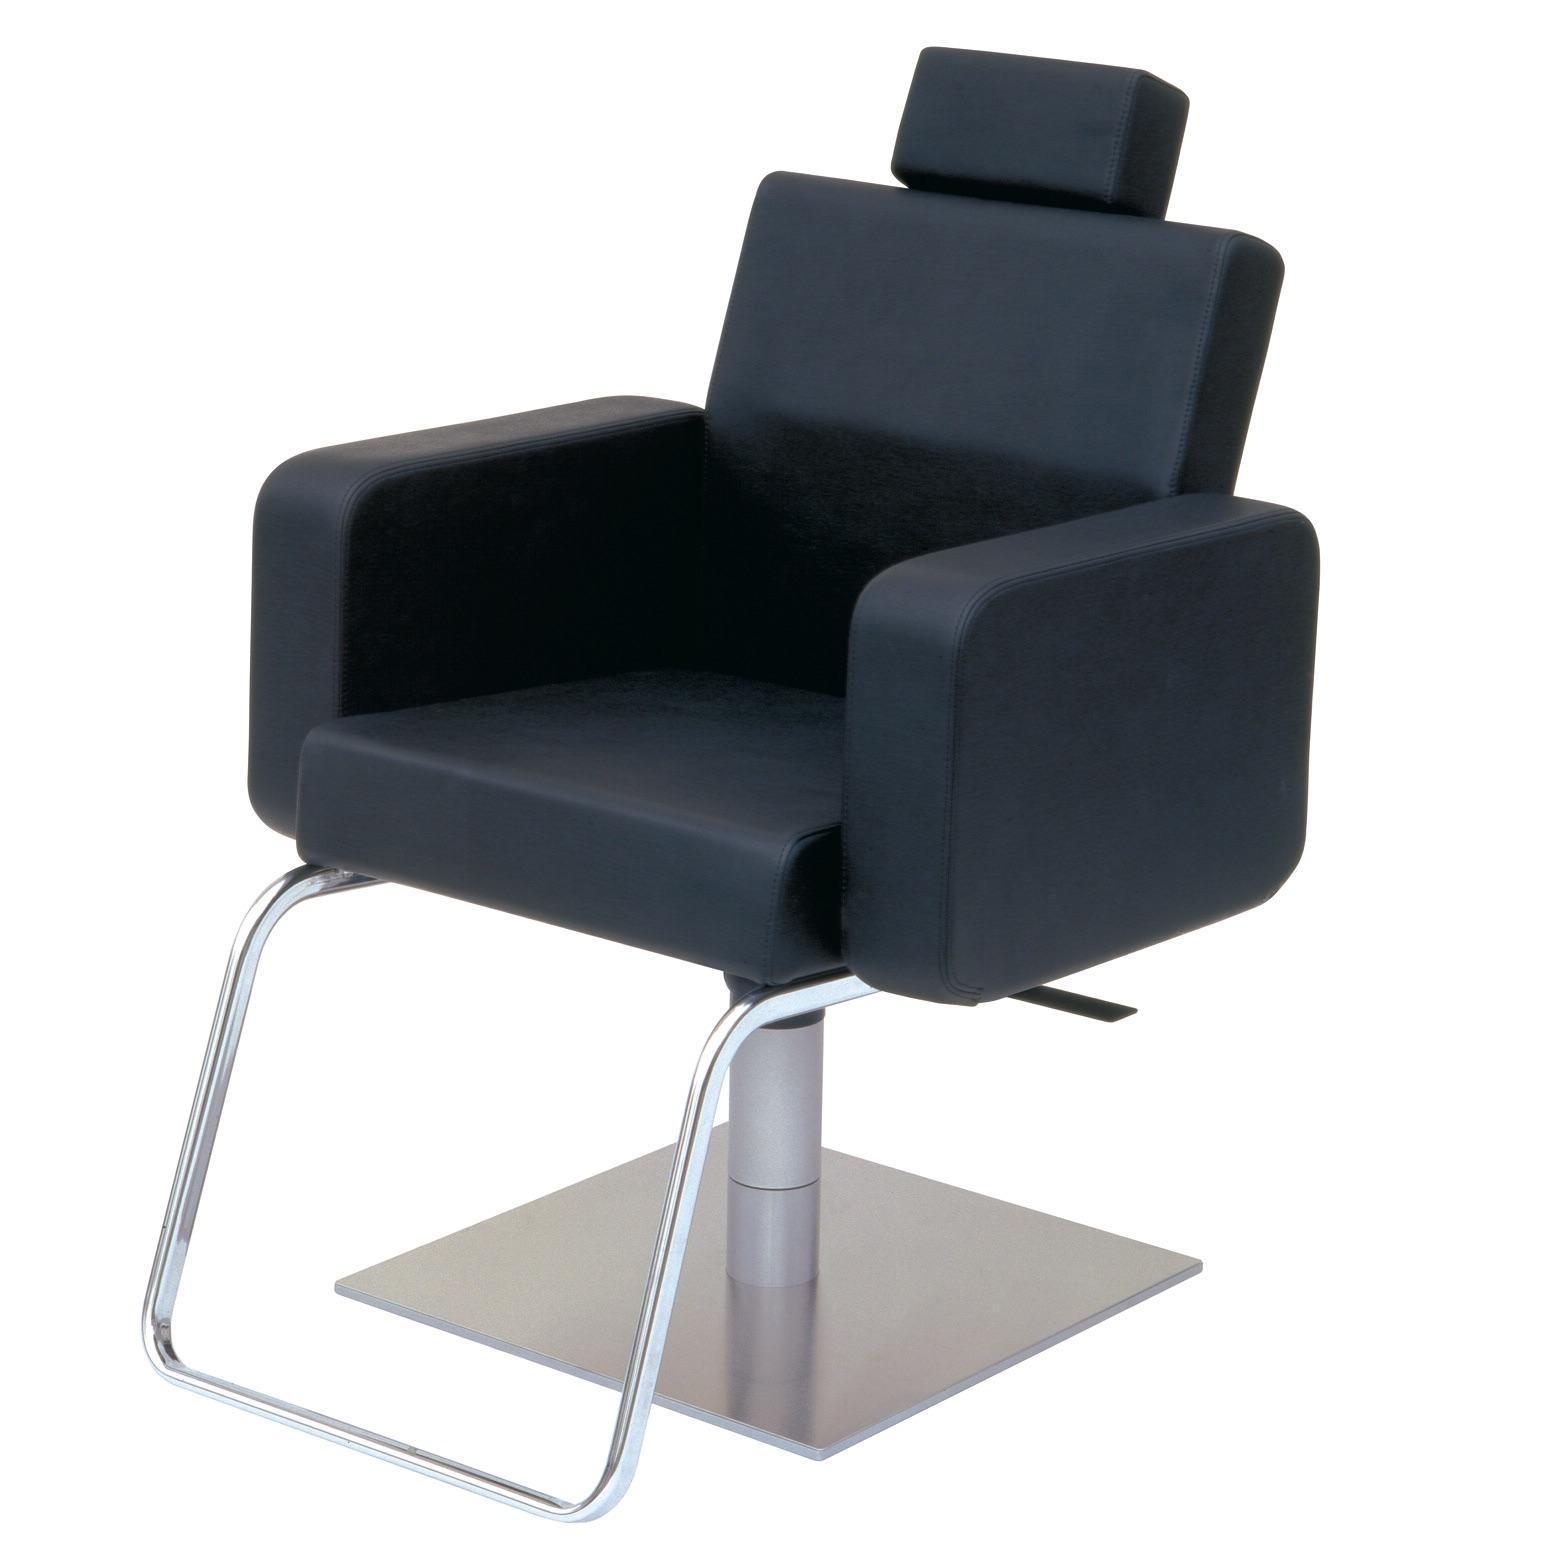 Barber Chair Model 904